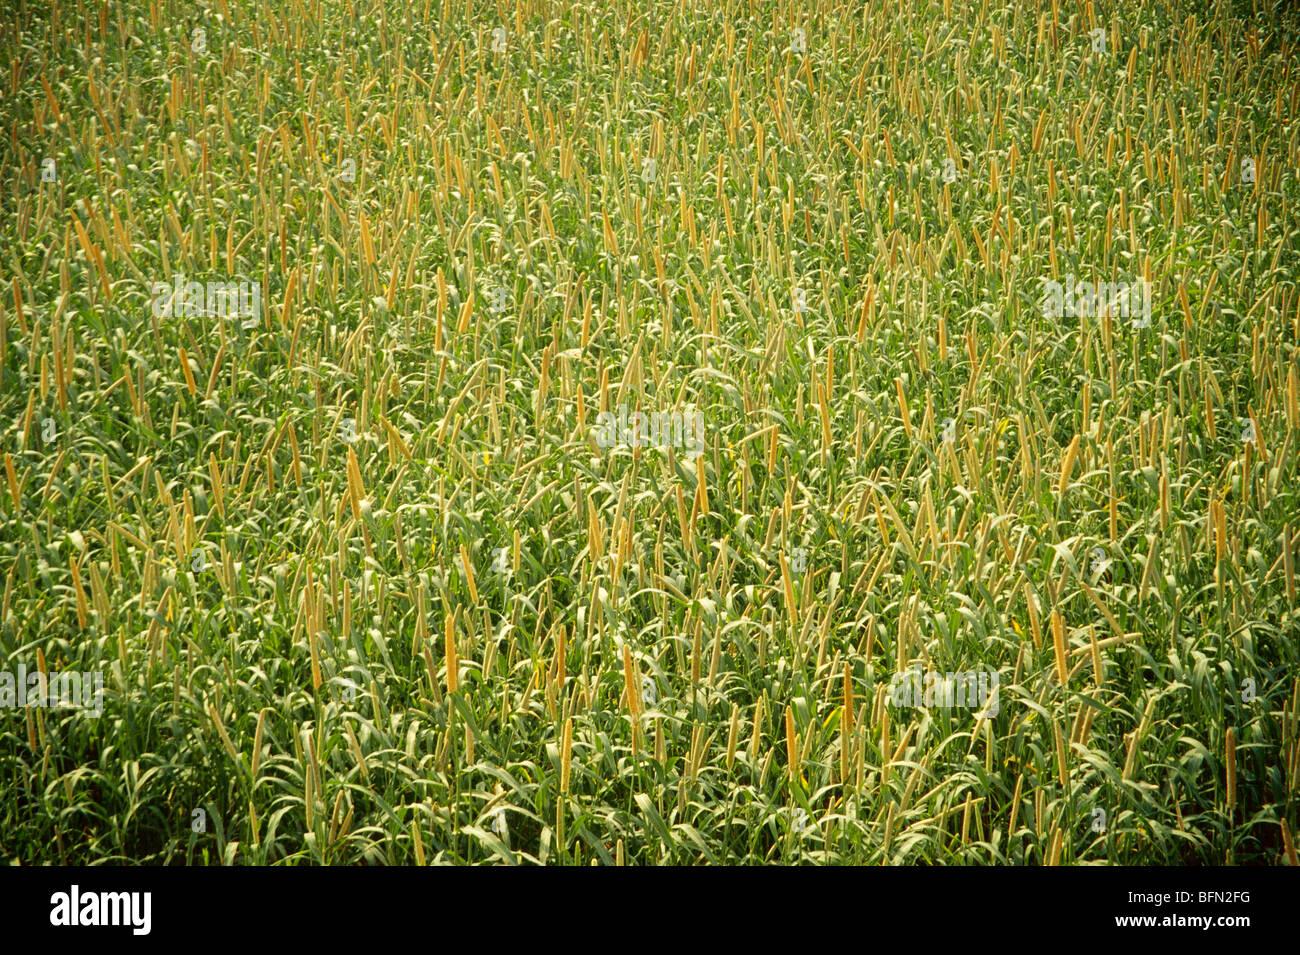 Bajra crop ; India - Stock Image